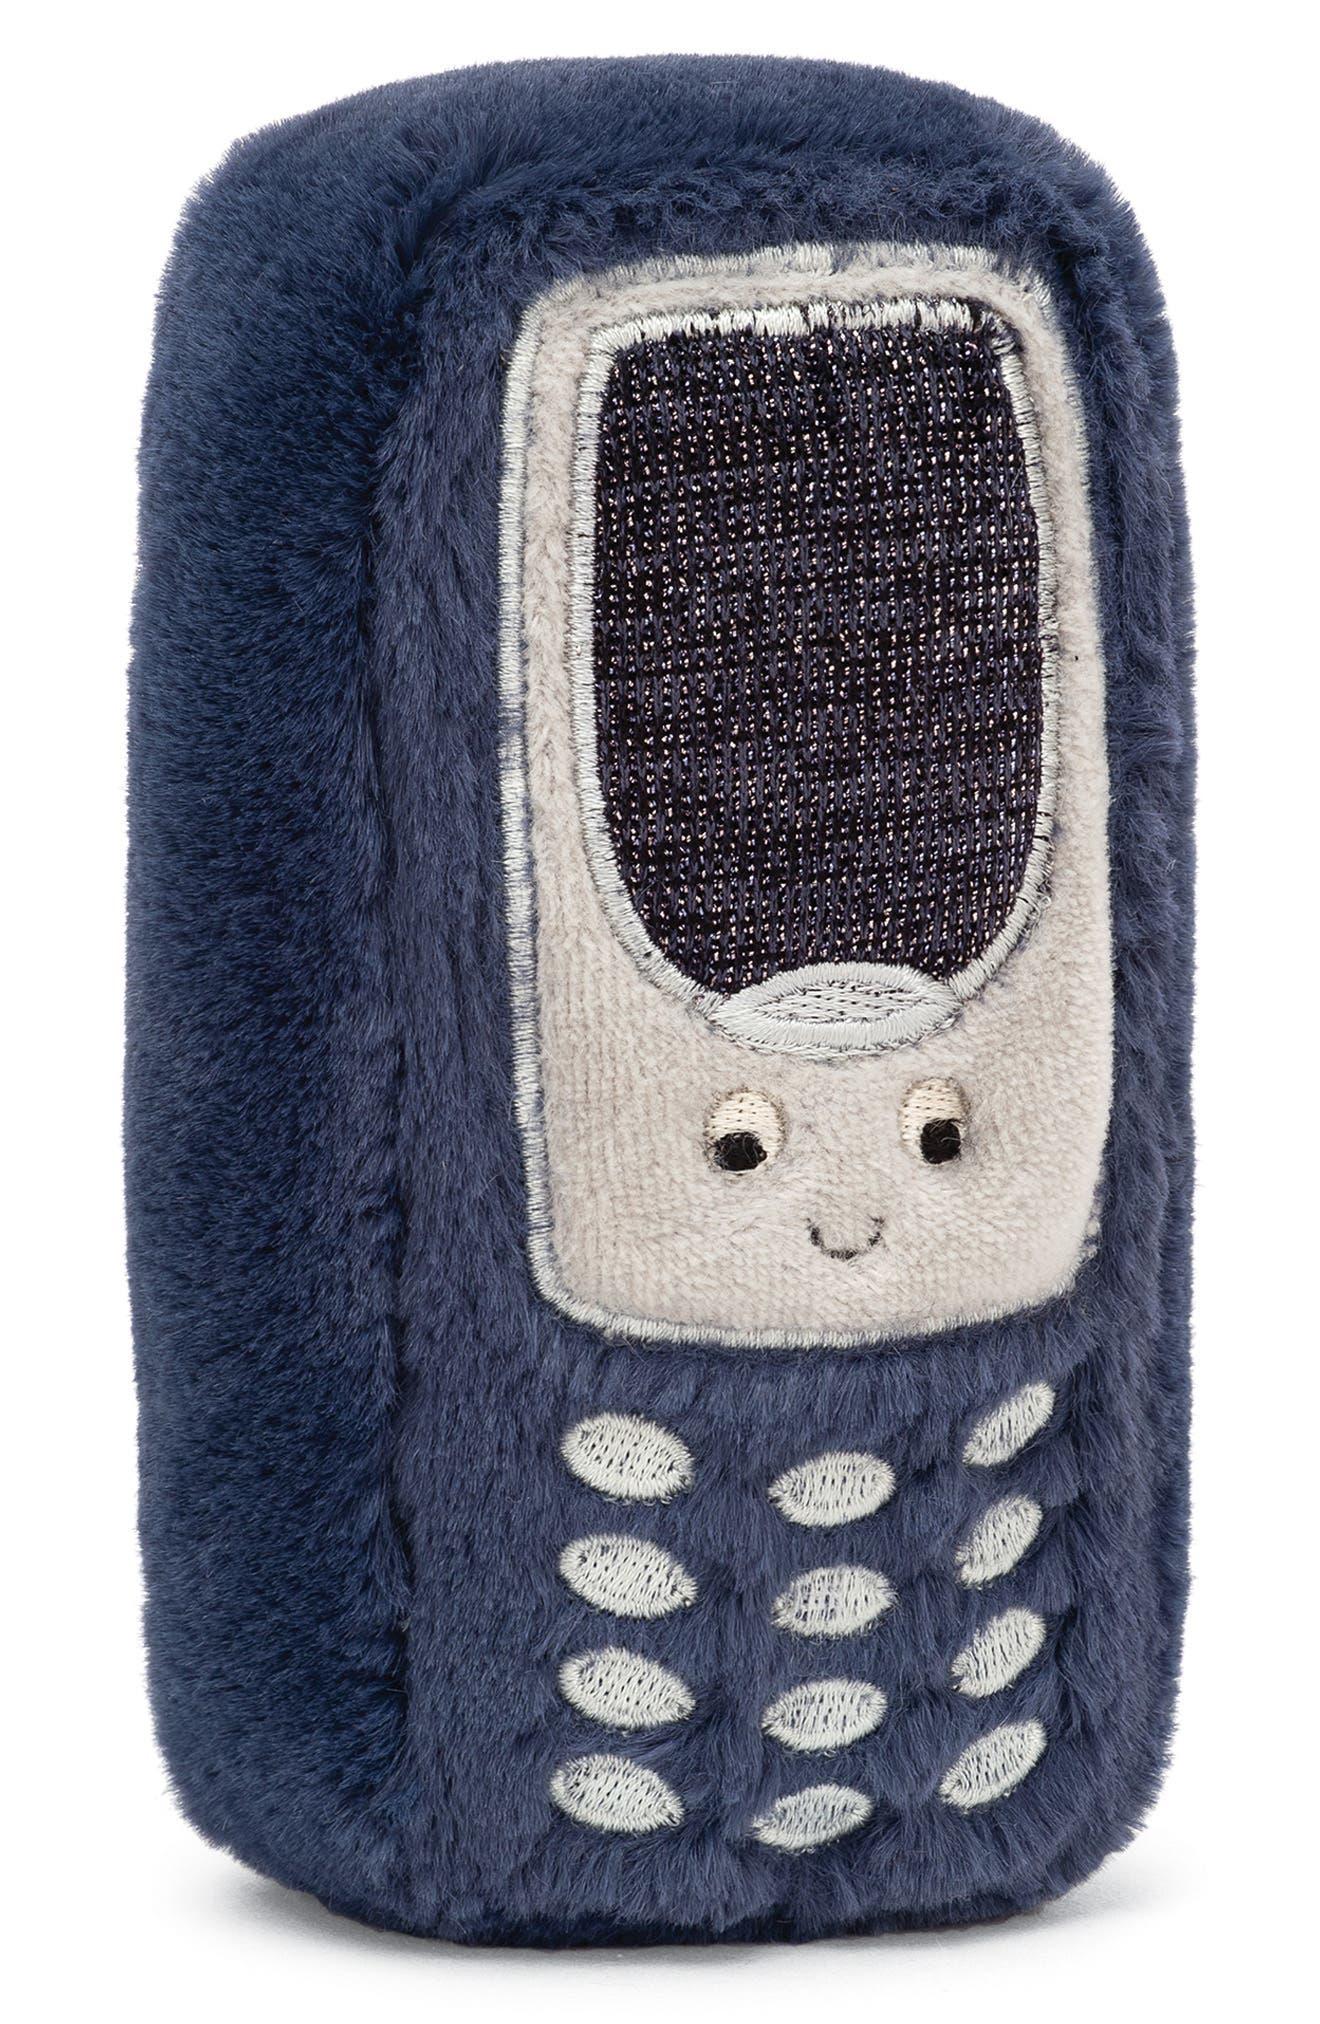 Jellycat Toddler Jellycat Wiggety Phone Plush Toy